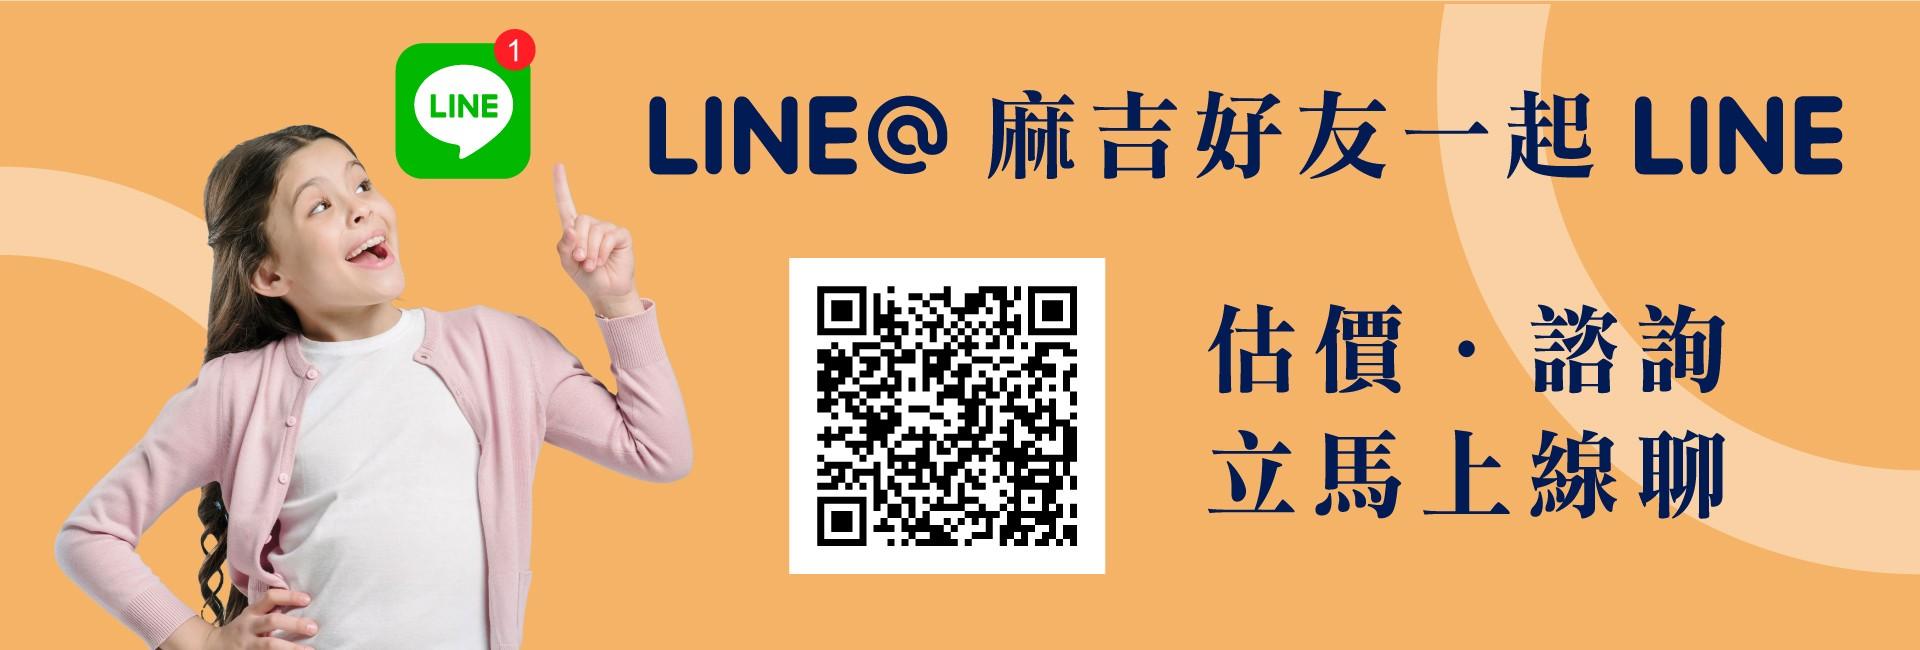 LINE-AT-固定頁面-PC_達印網